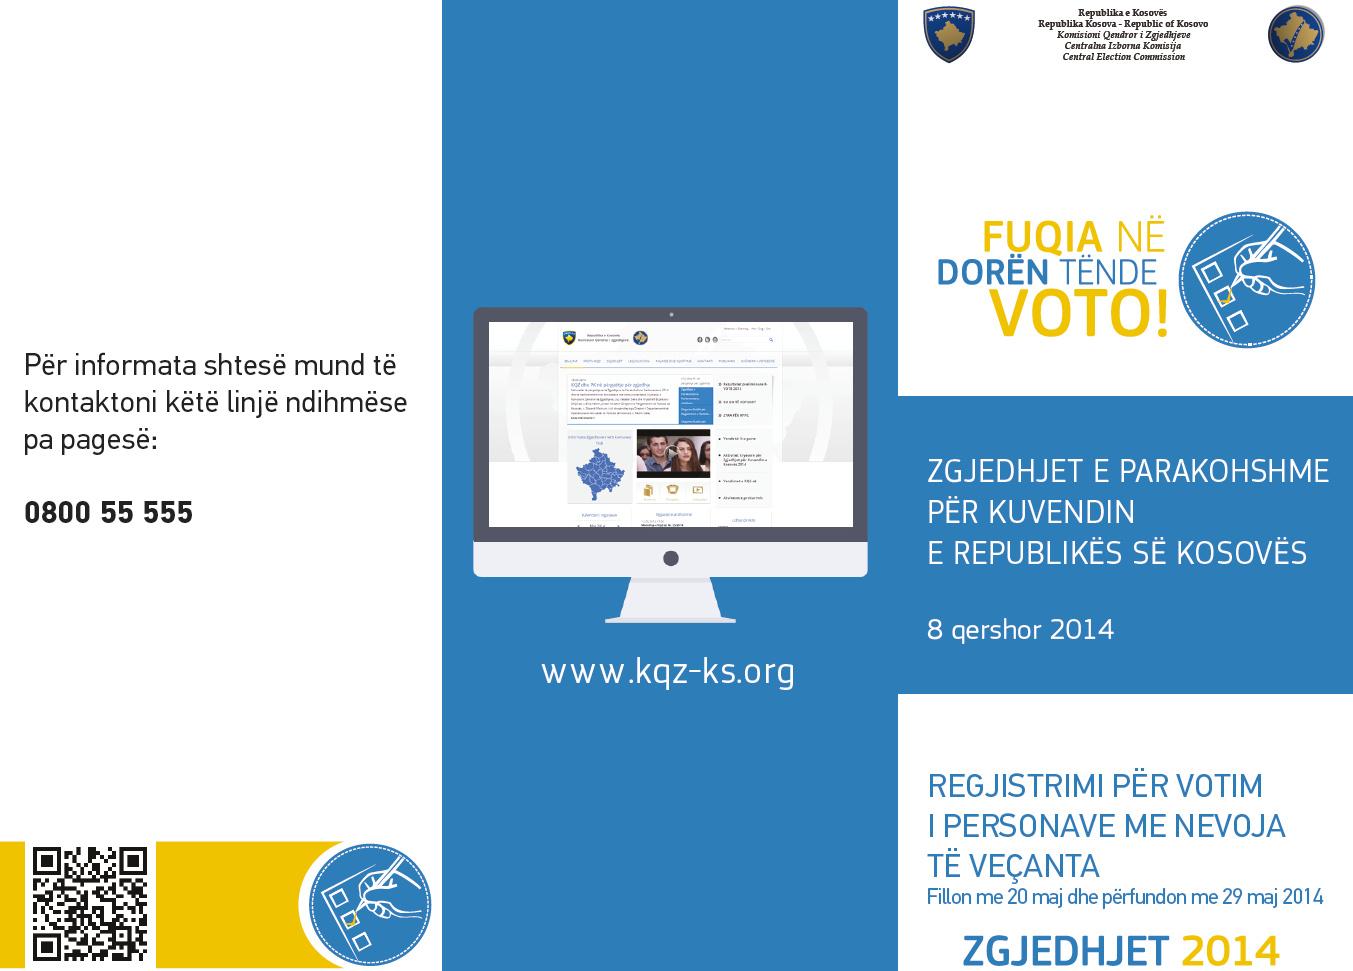 Pasaporta e kosoves online dating